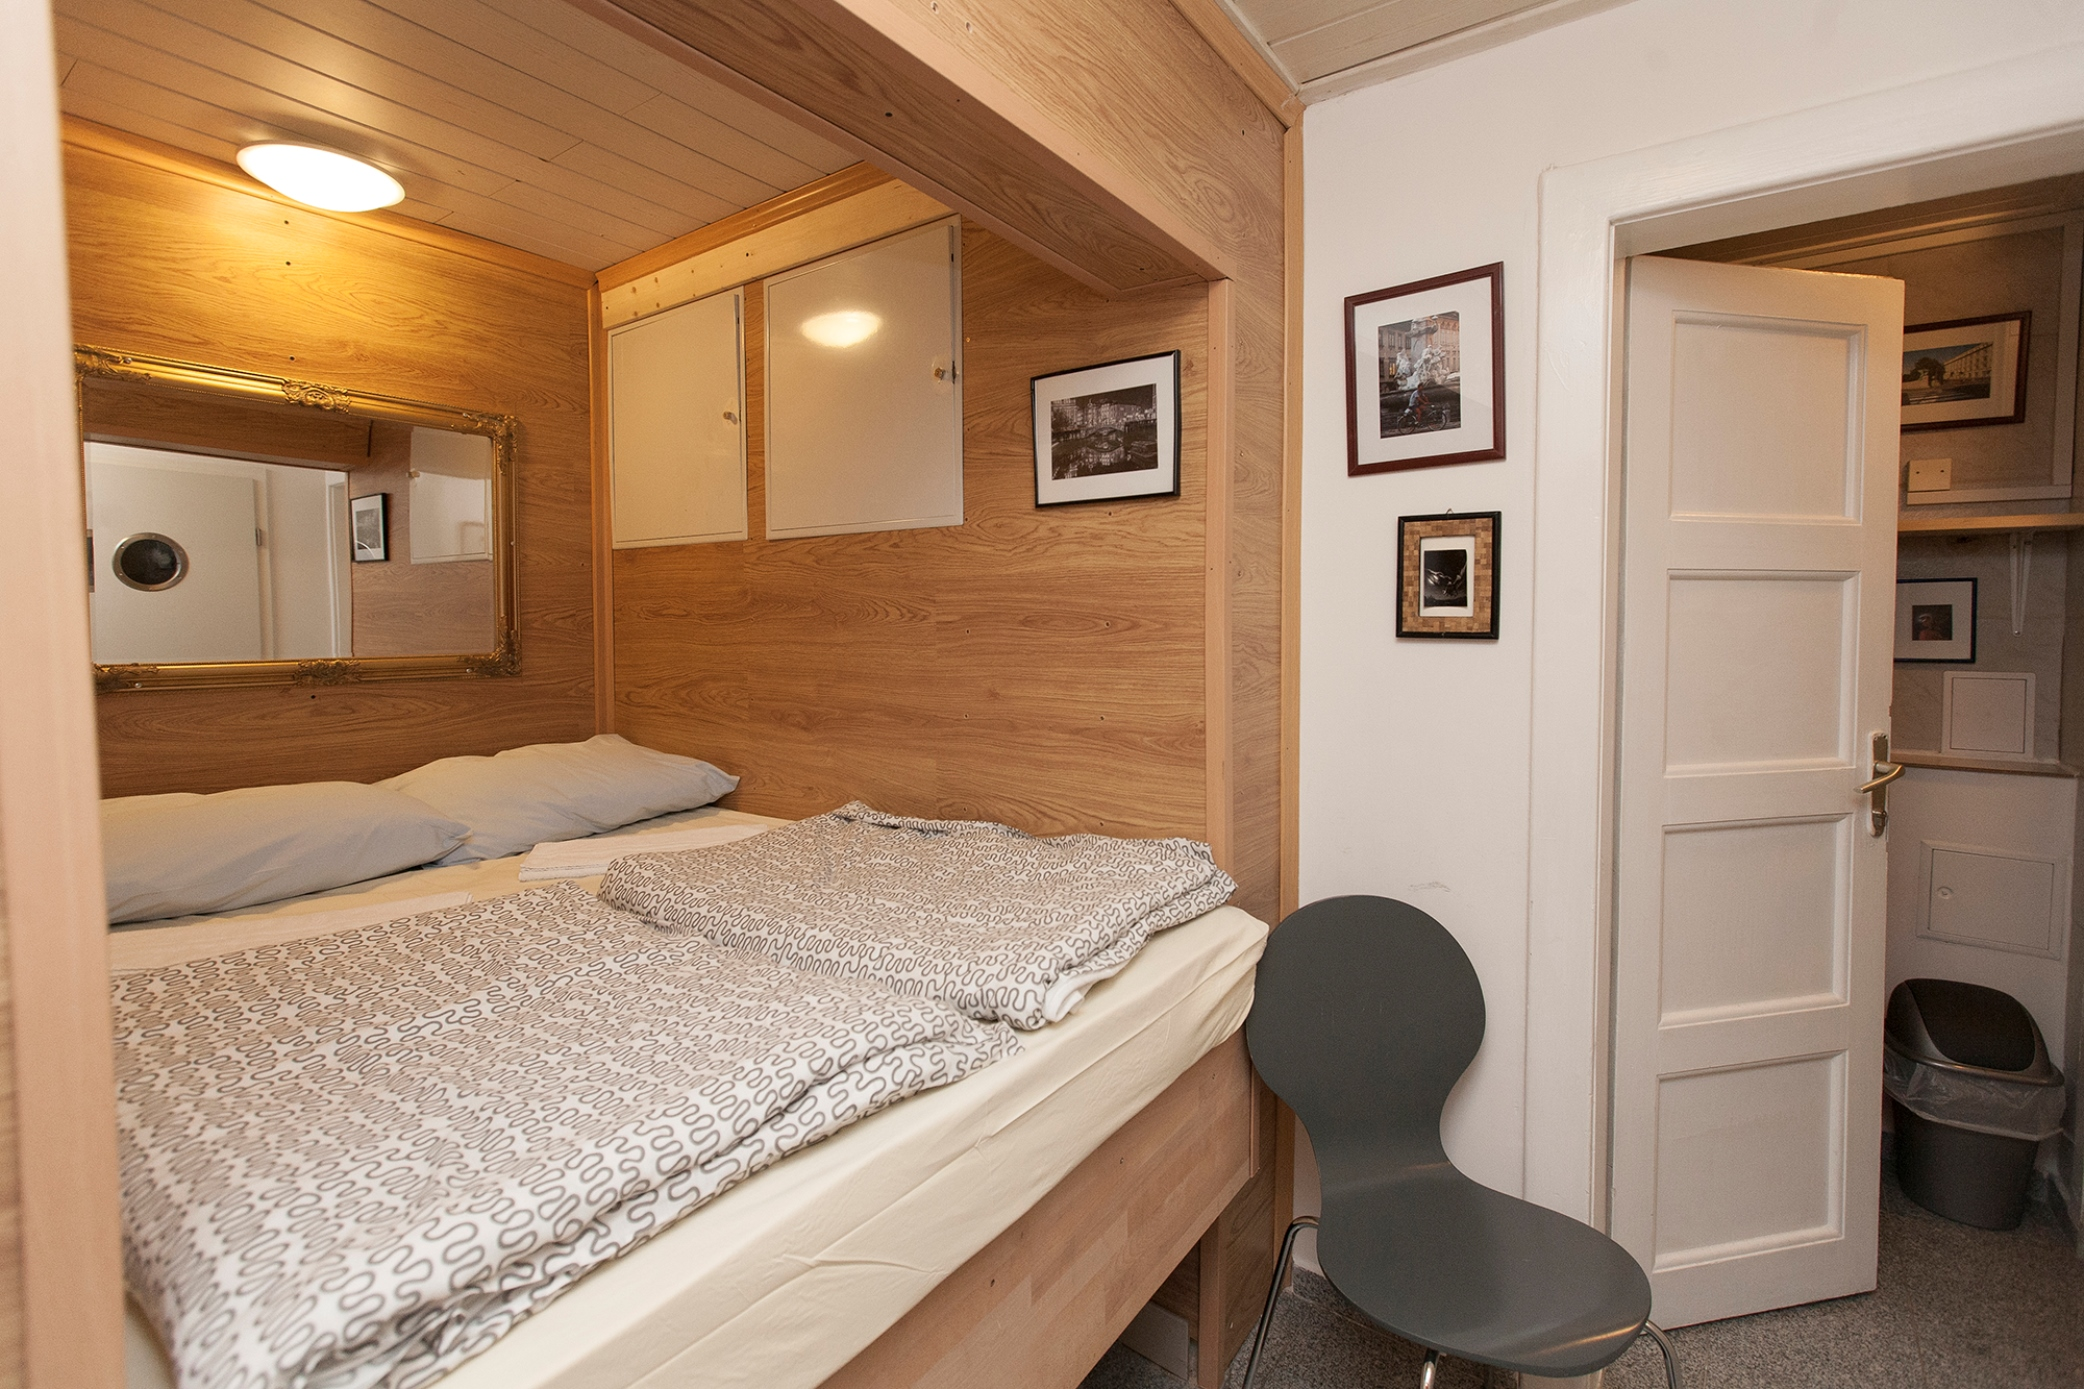 Hostel 24